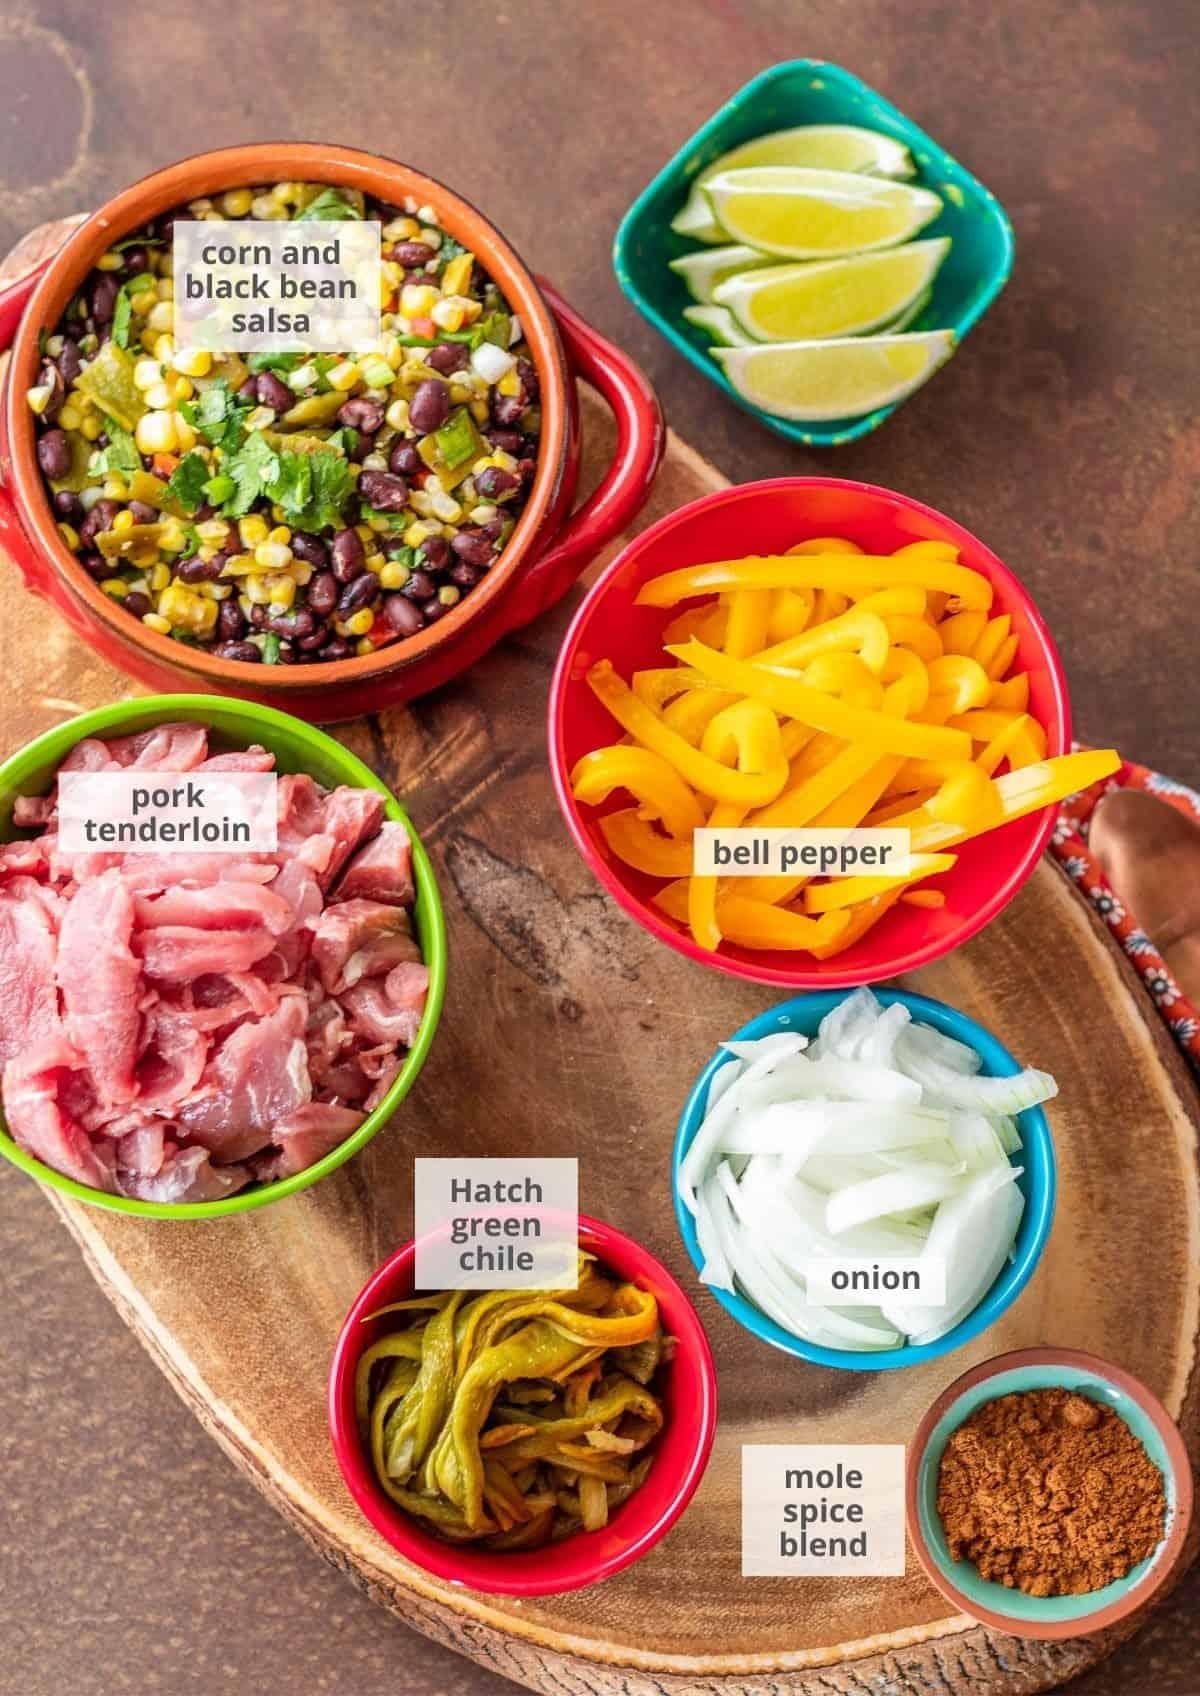 Ingredients for pork fajita tacos on a wood burl cutting board in bright prep bowls.